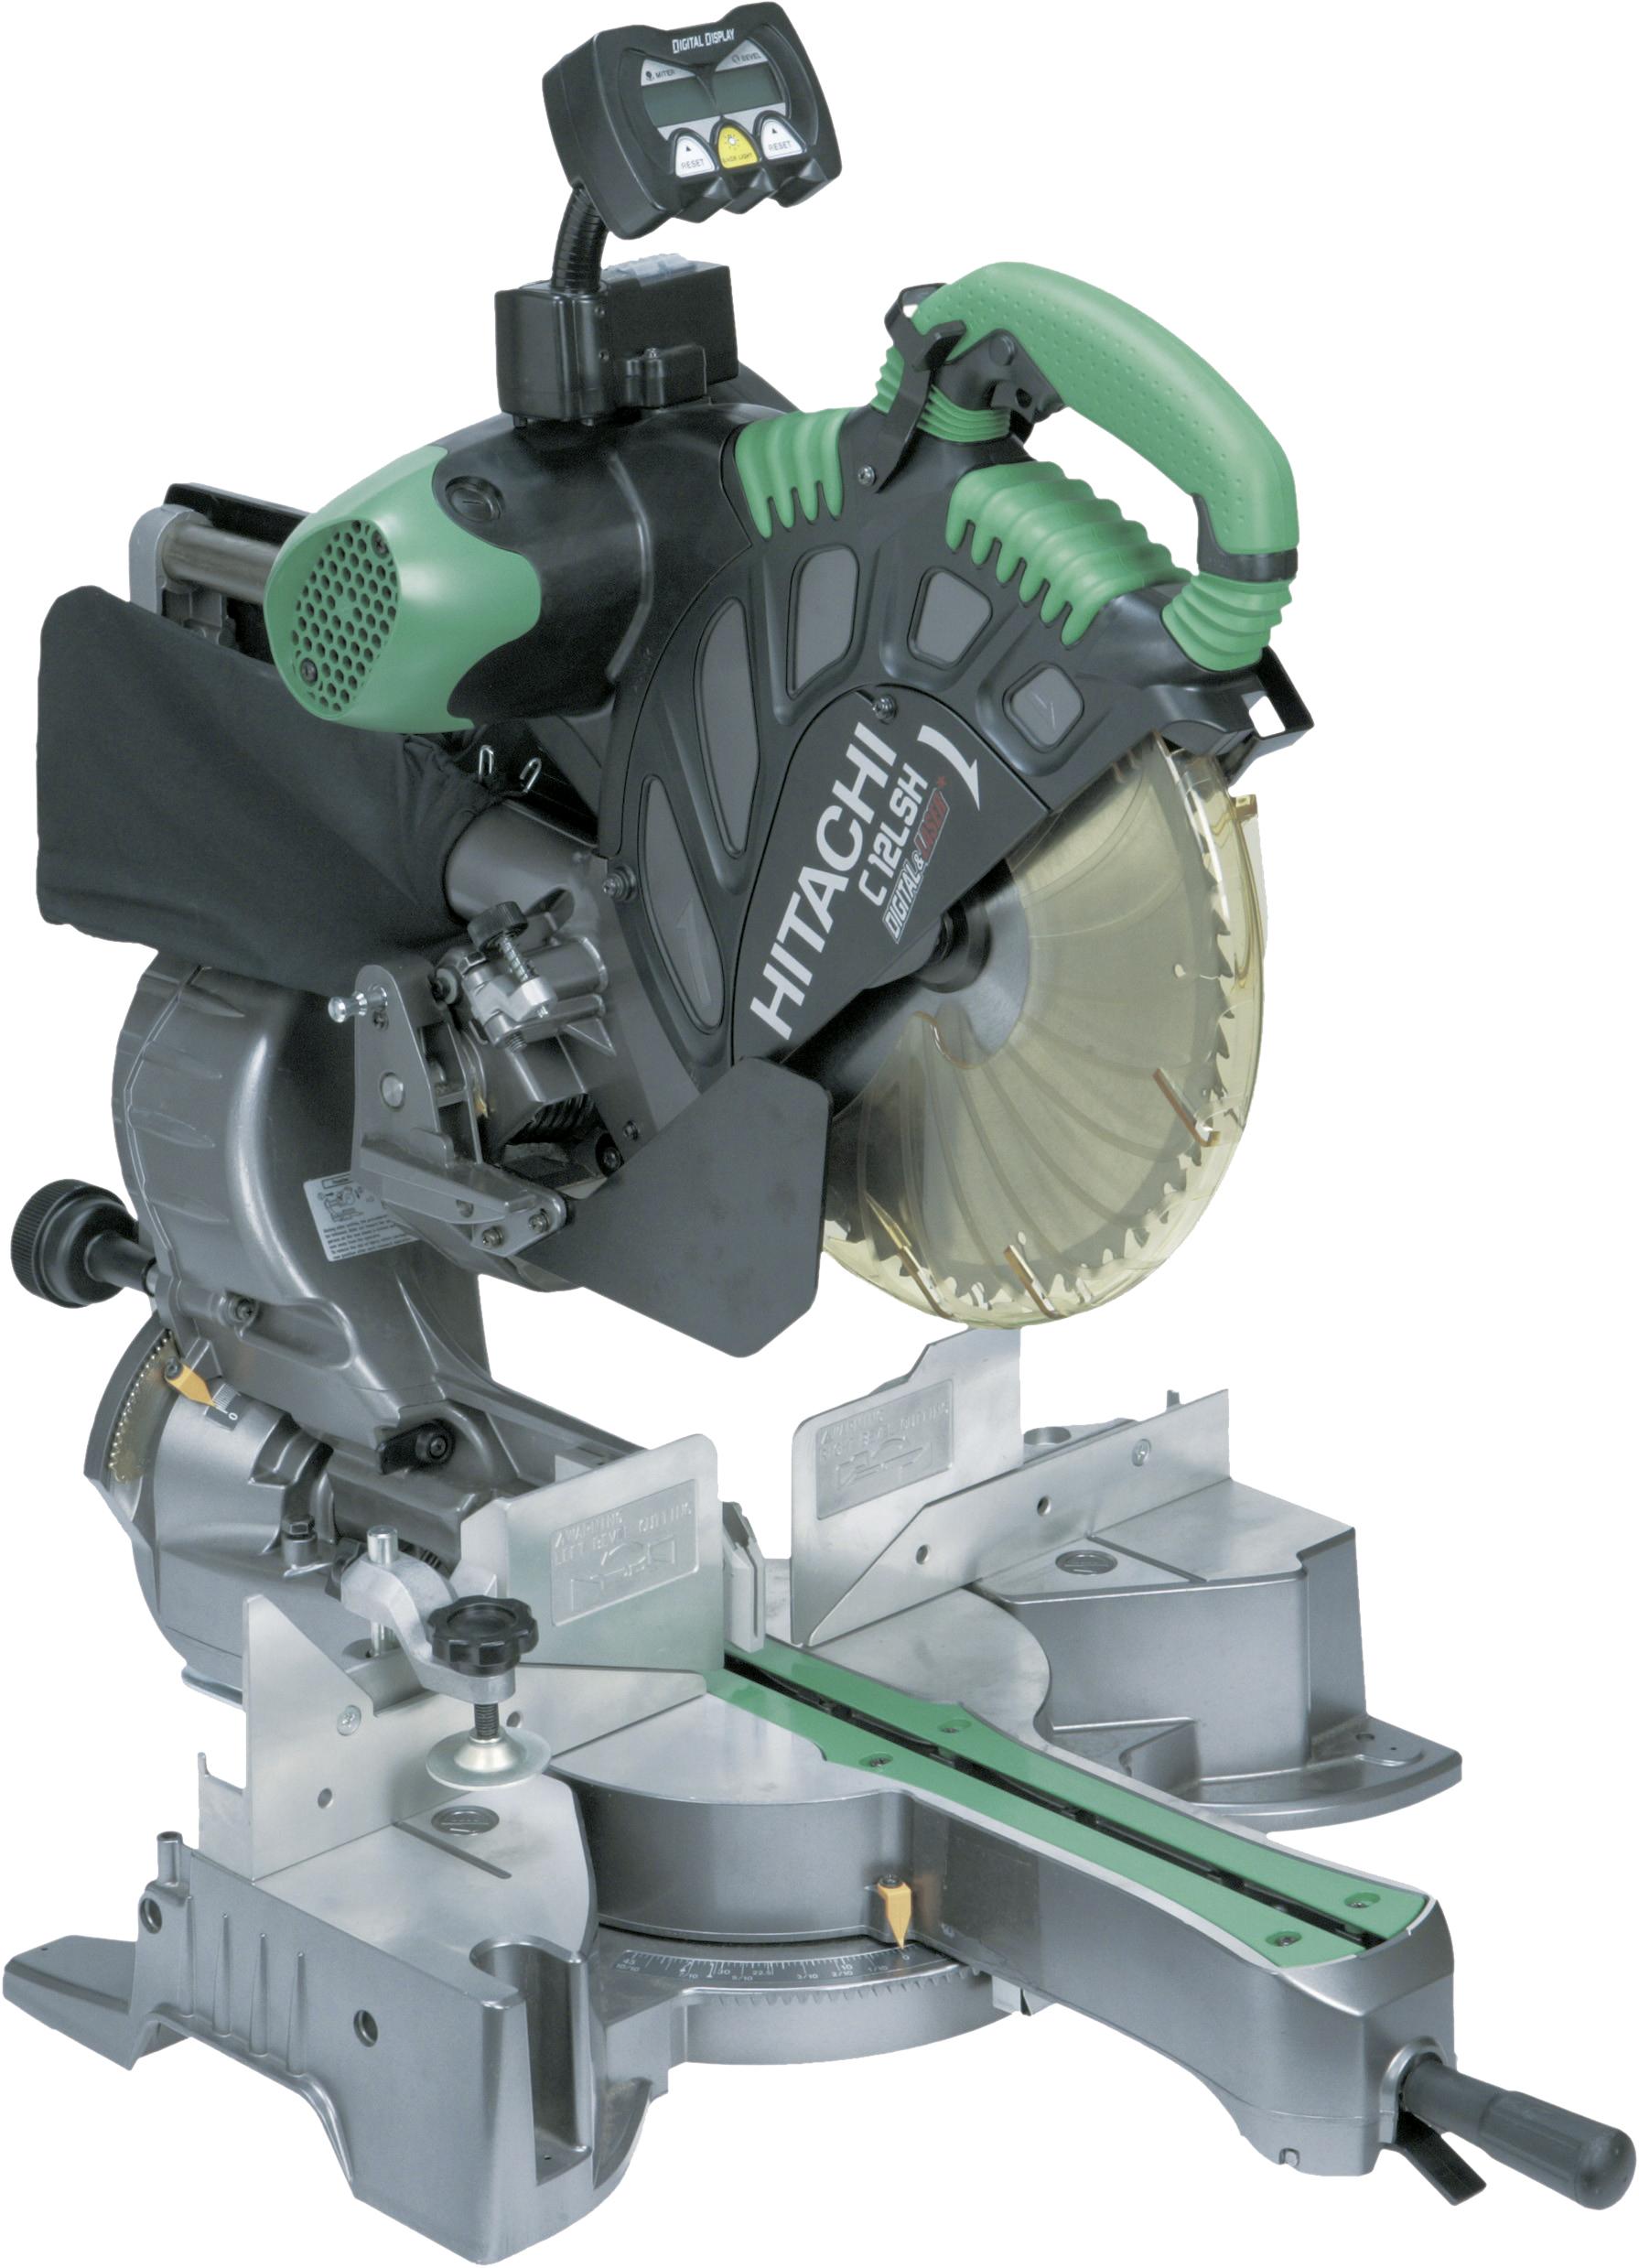 C12LSH-Ingletadora-telecopica-305mm-1520W